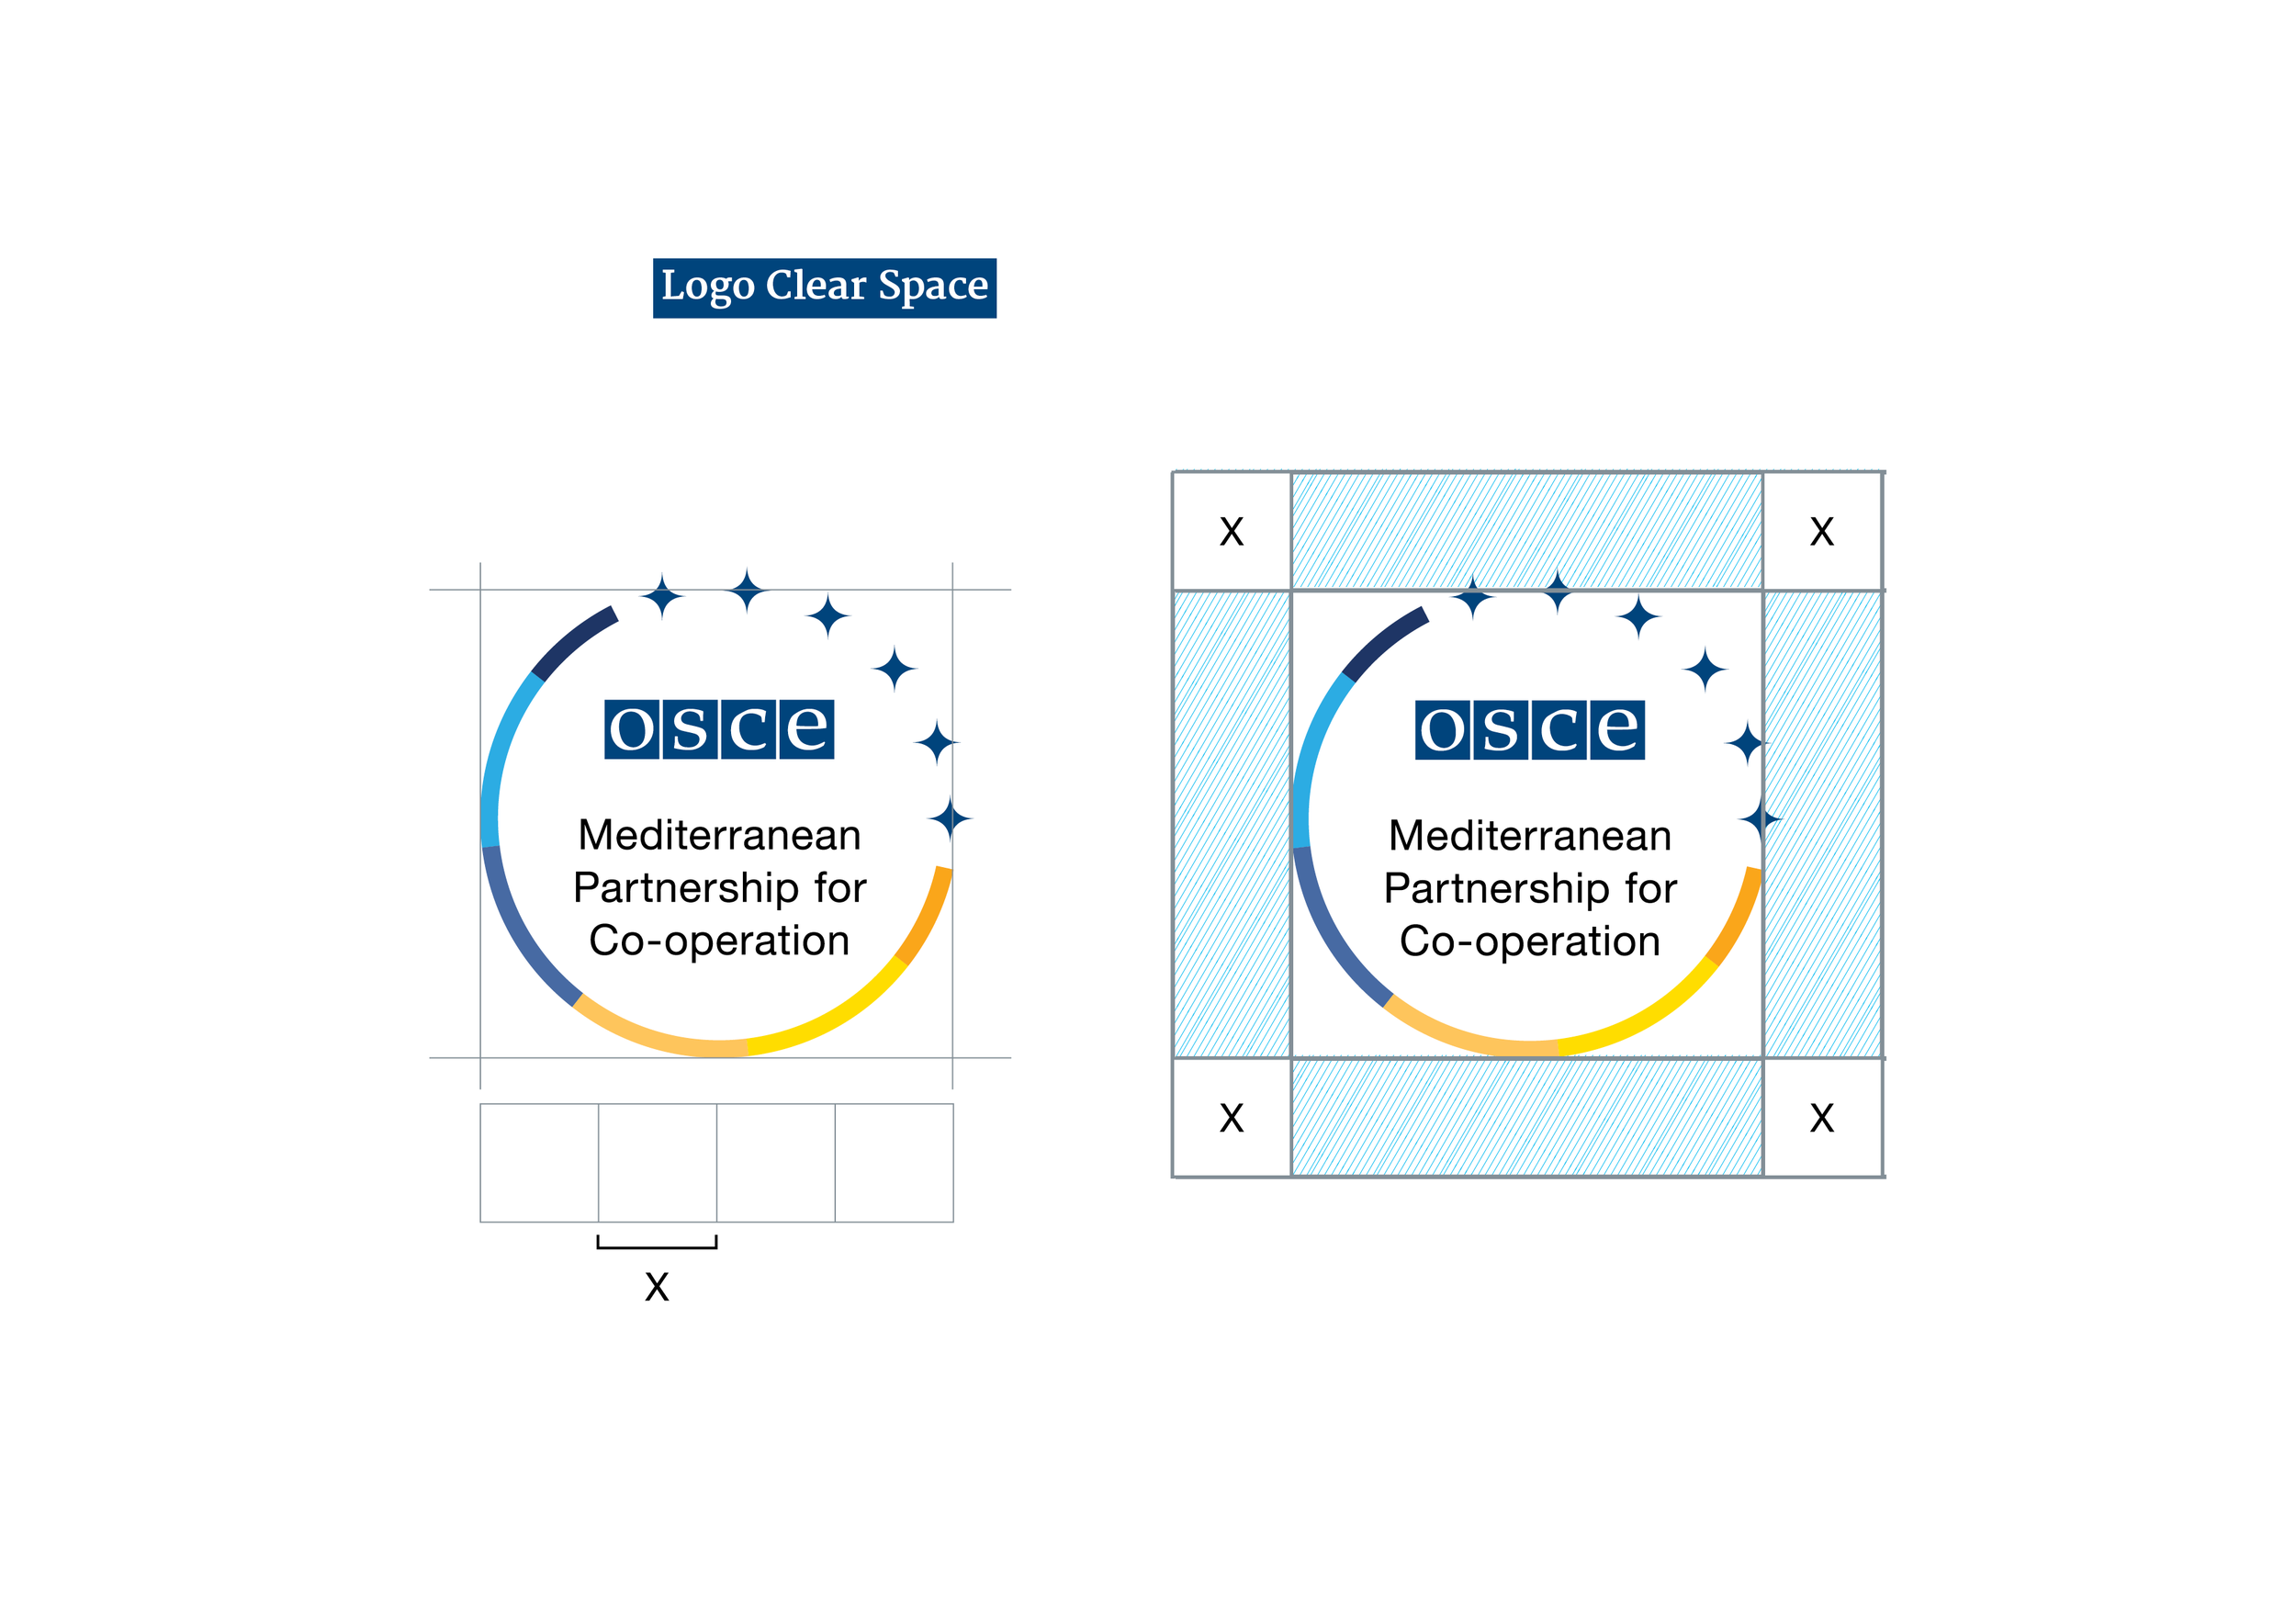 OSCE_Partnership_Logo_Graphic_Charter_31101611.png